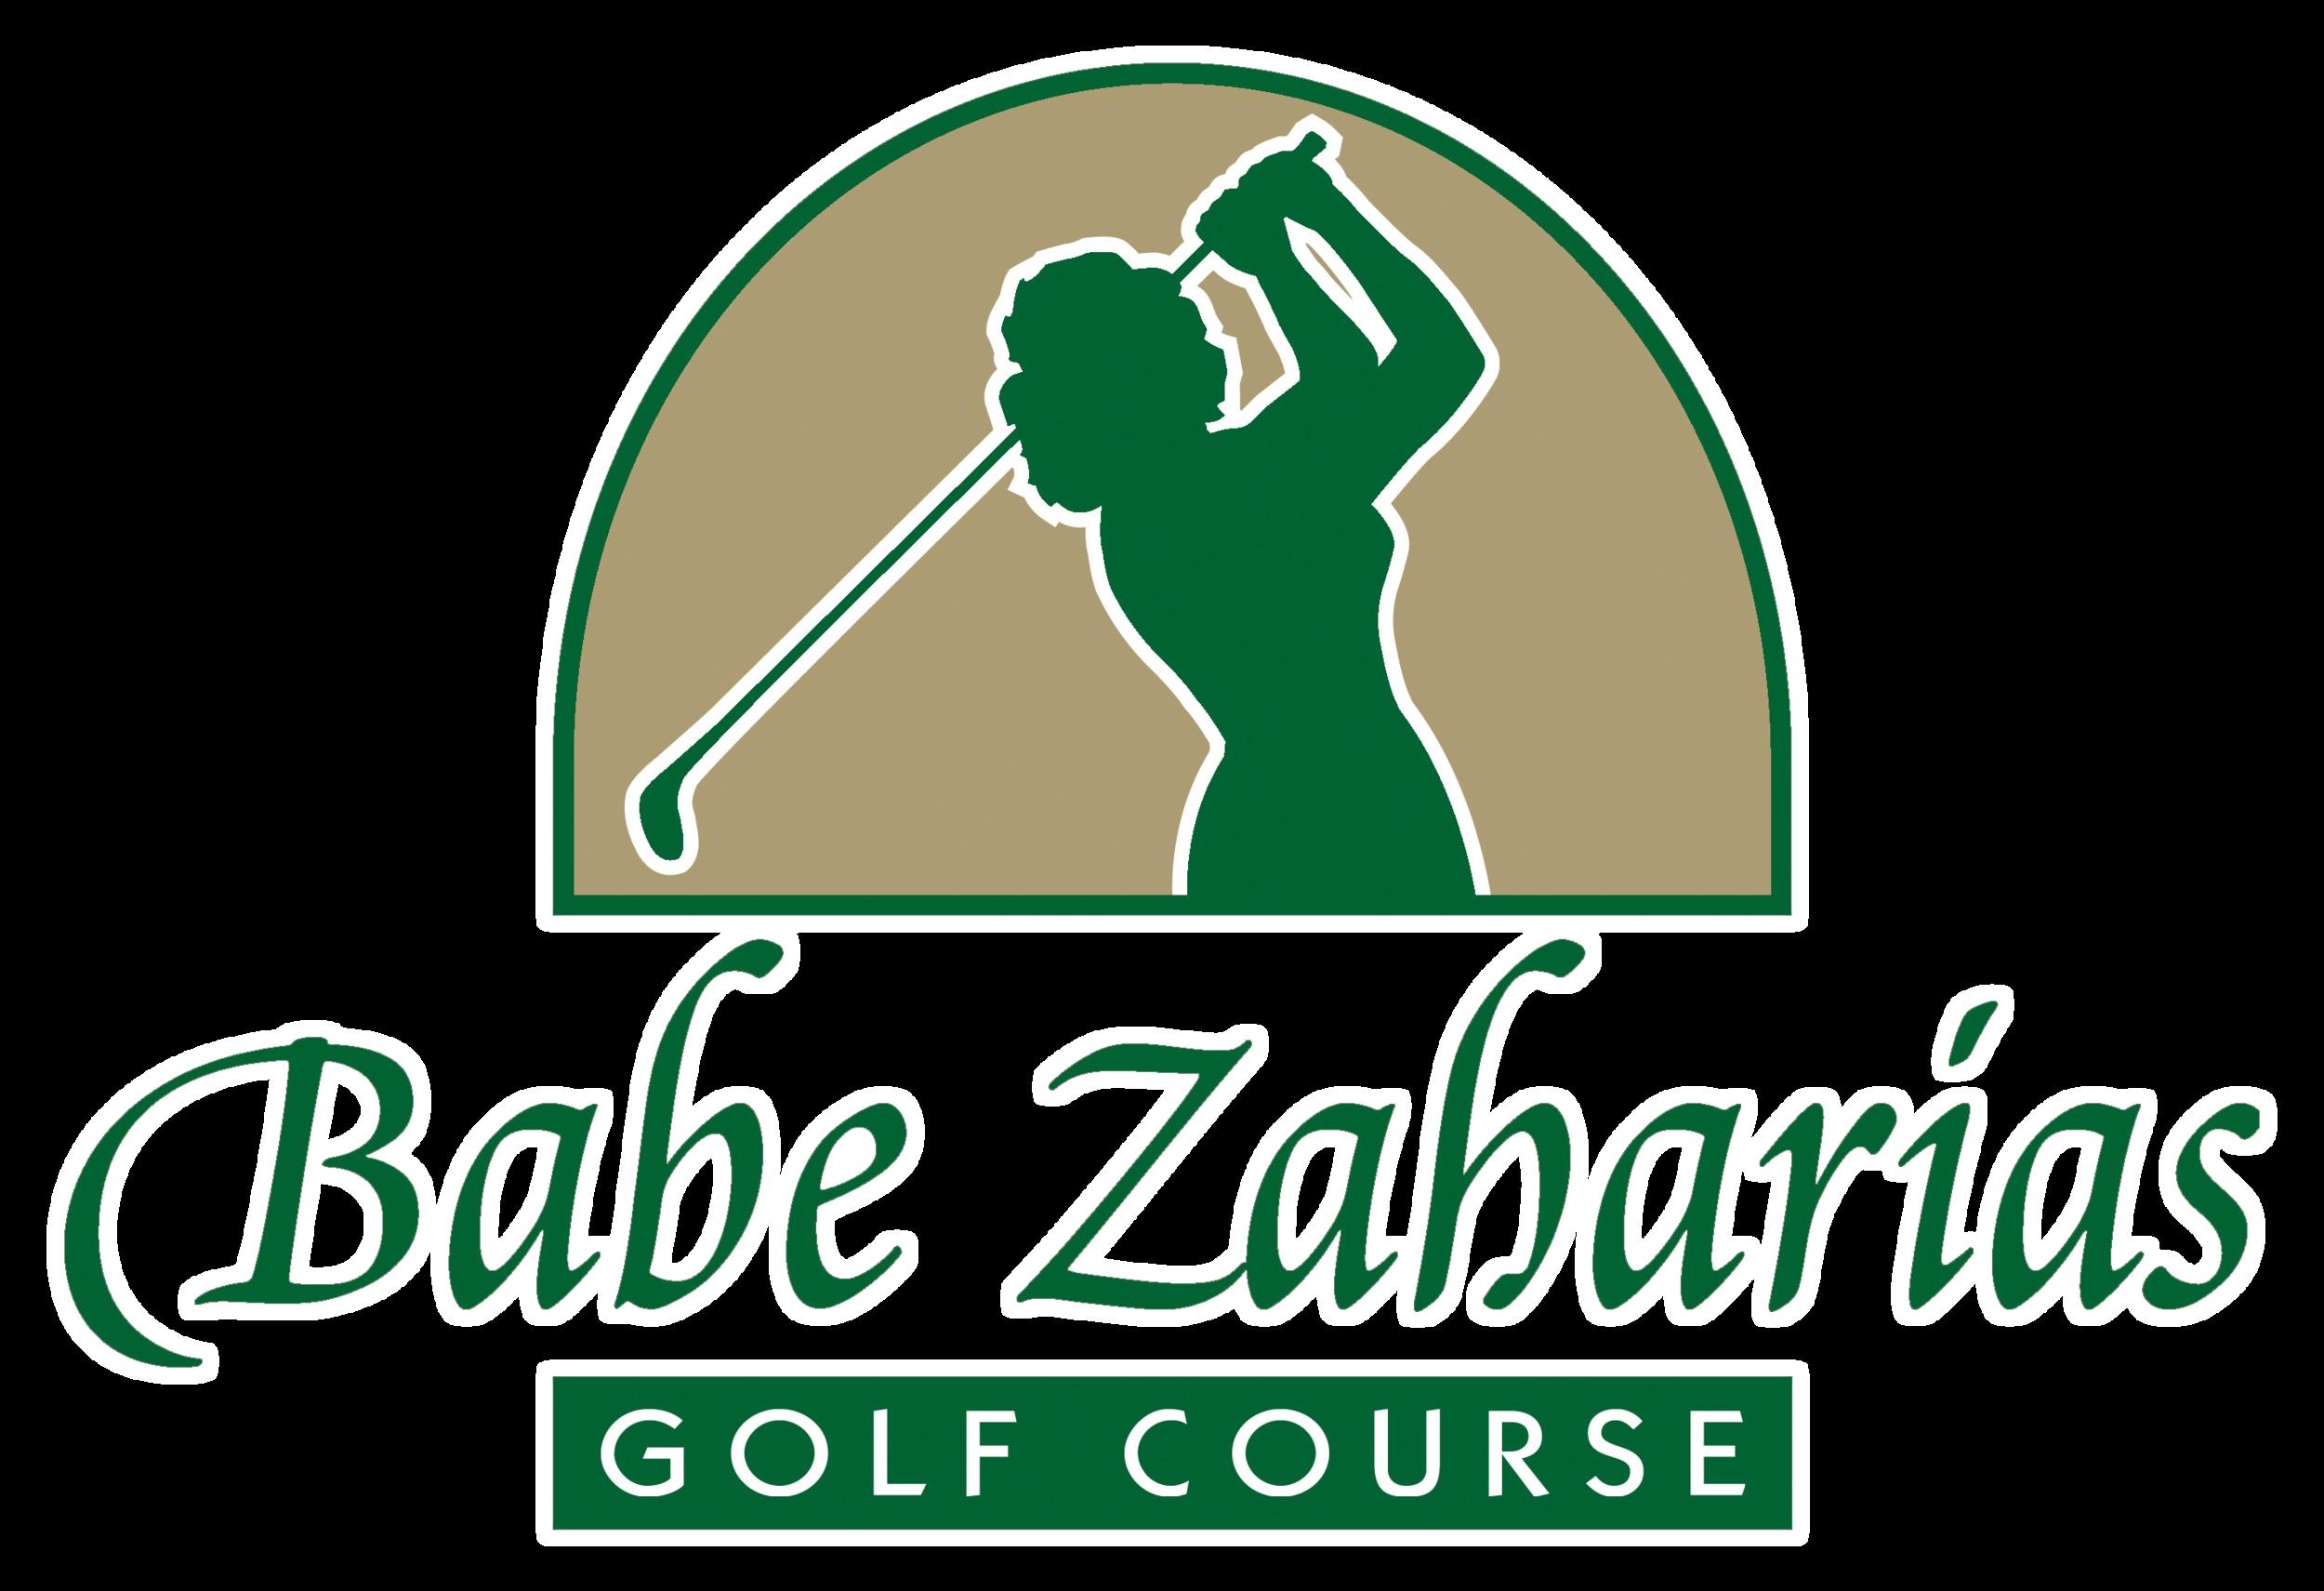 Babe Zaharias Golf